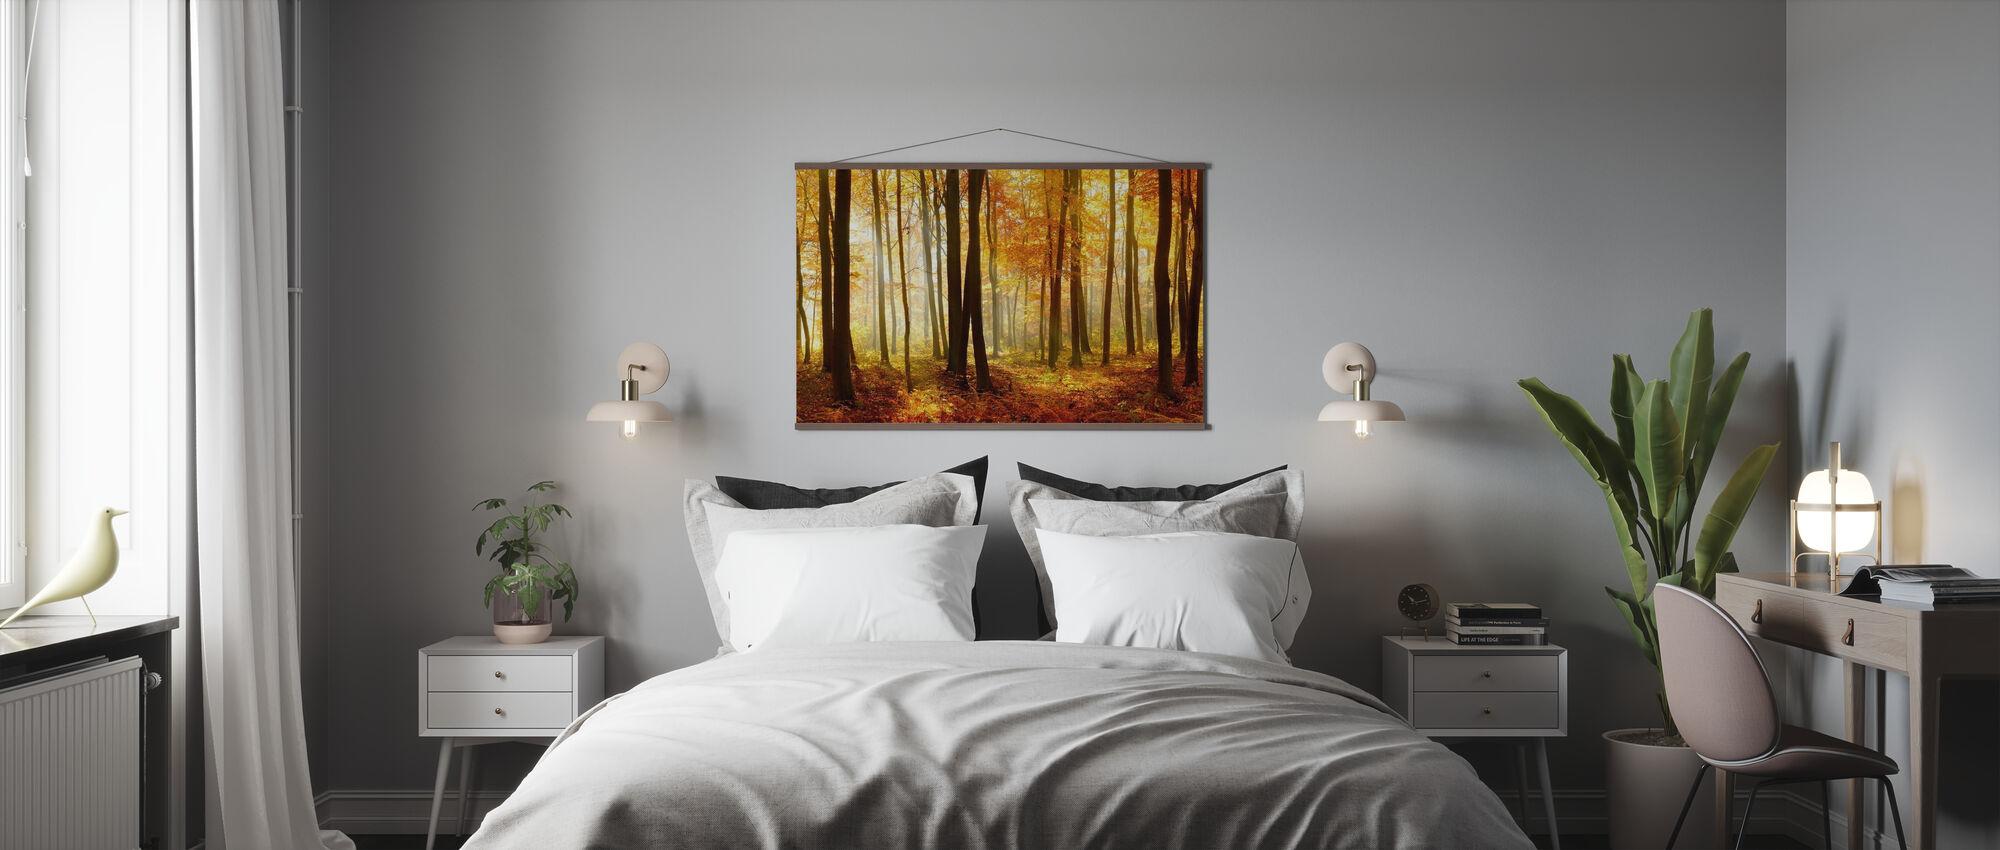 Japanese Forest - Poster - Bedroom